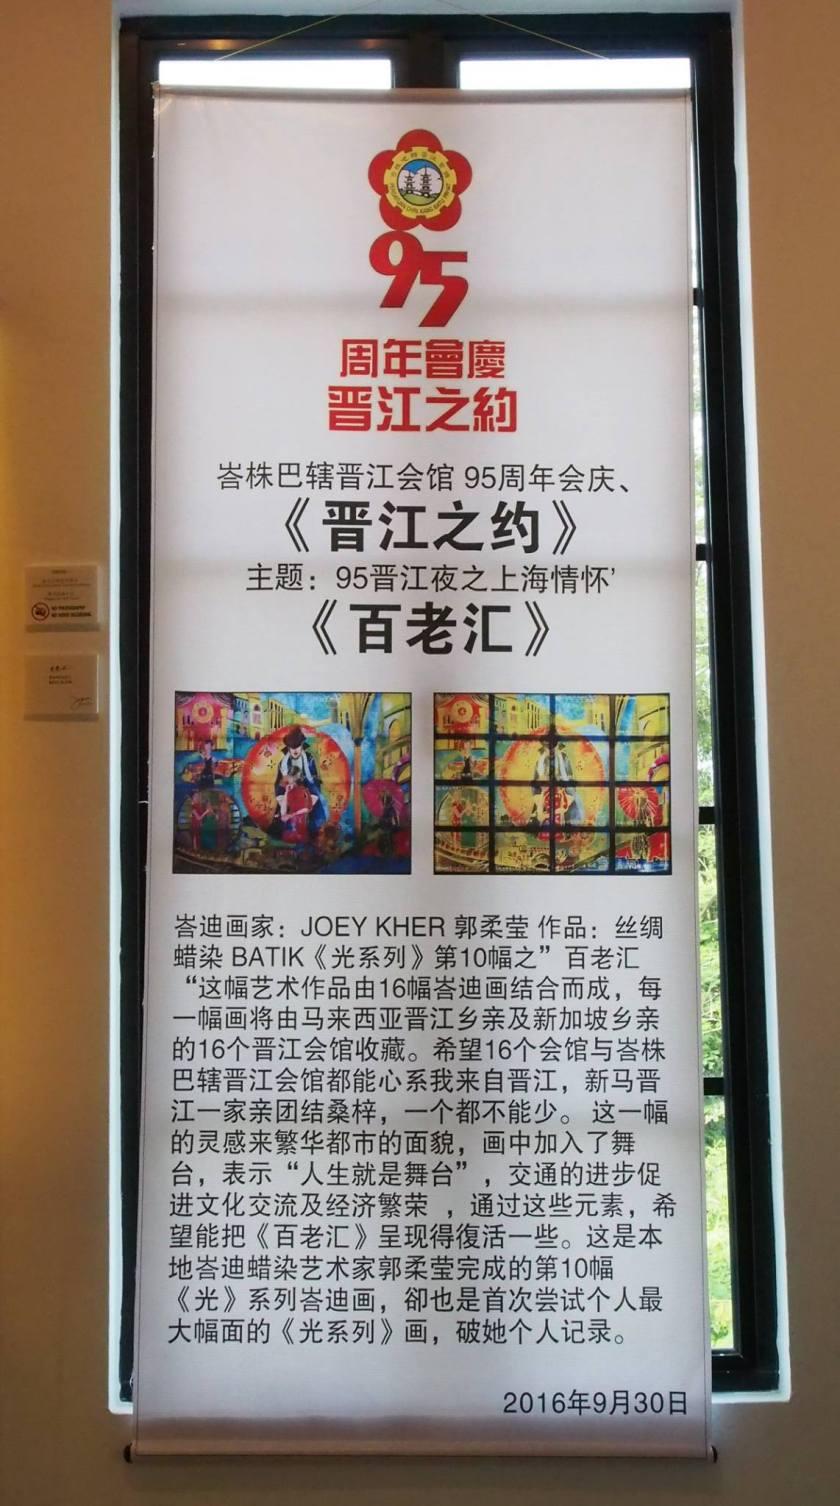 joey-kher-batik-aotu-exhibition-broadway-artwork-description